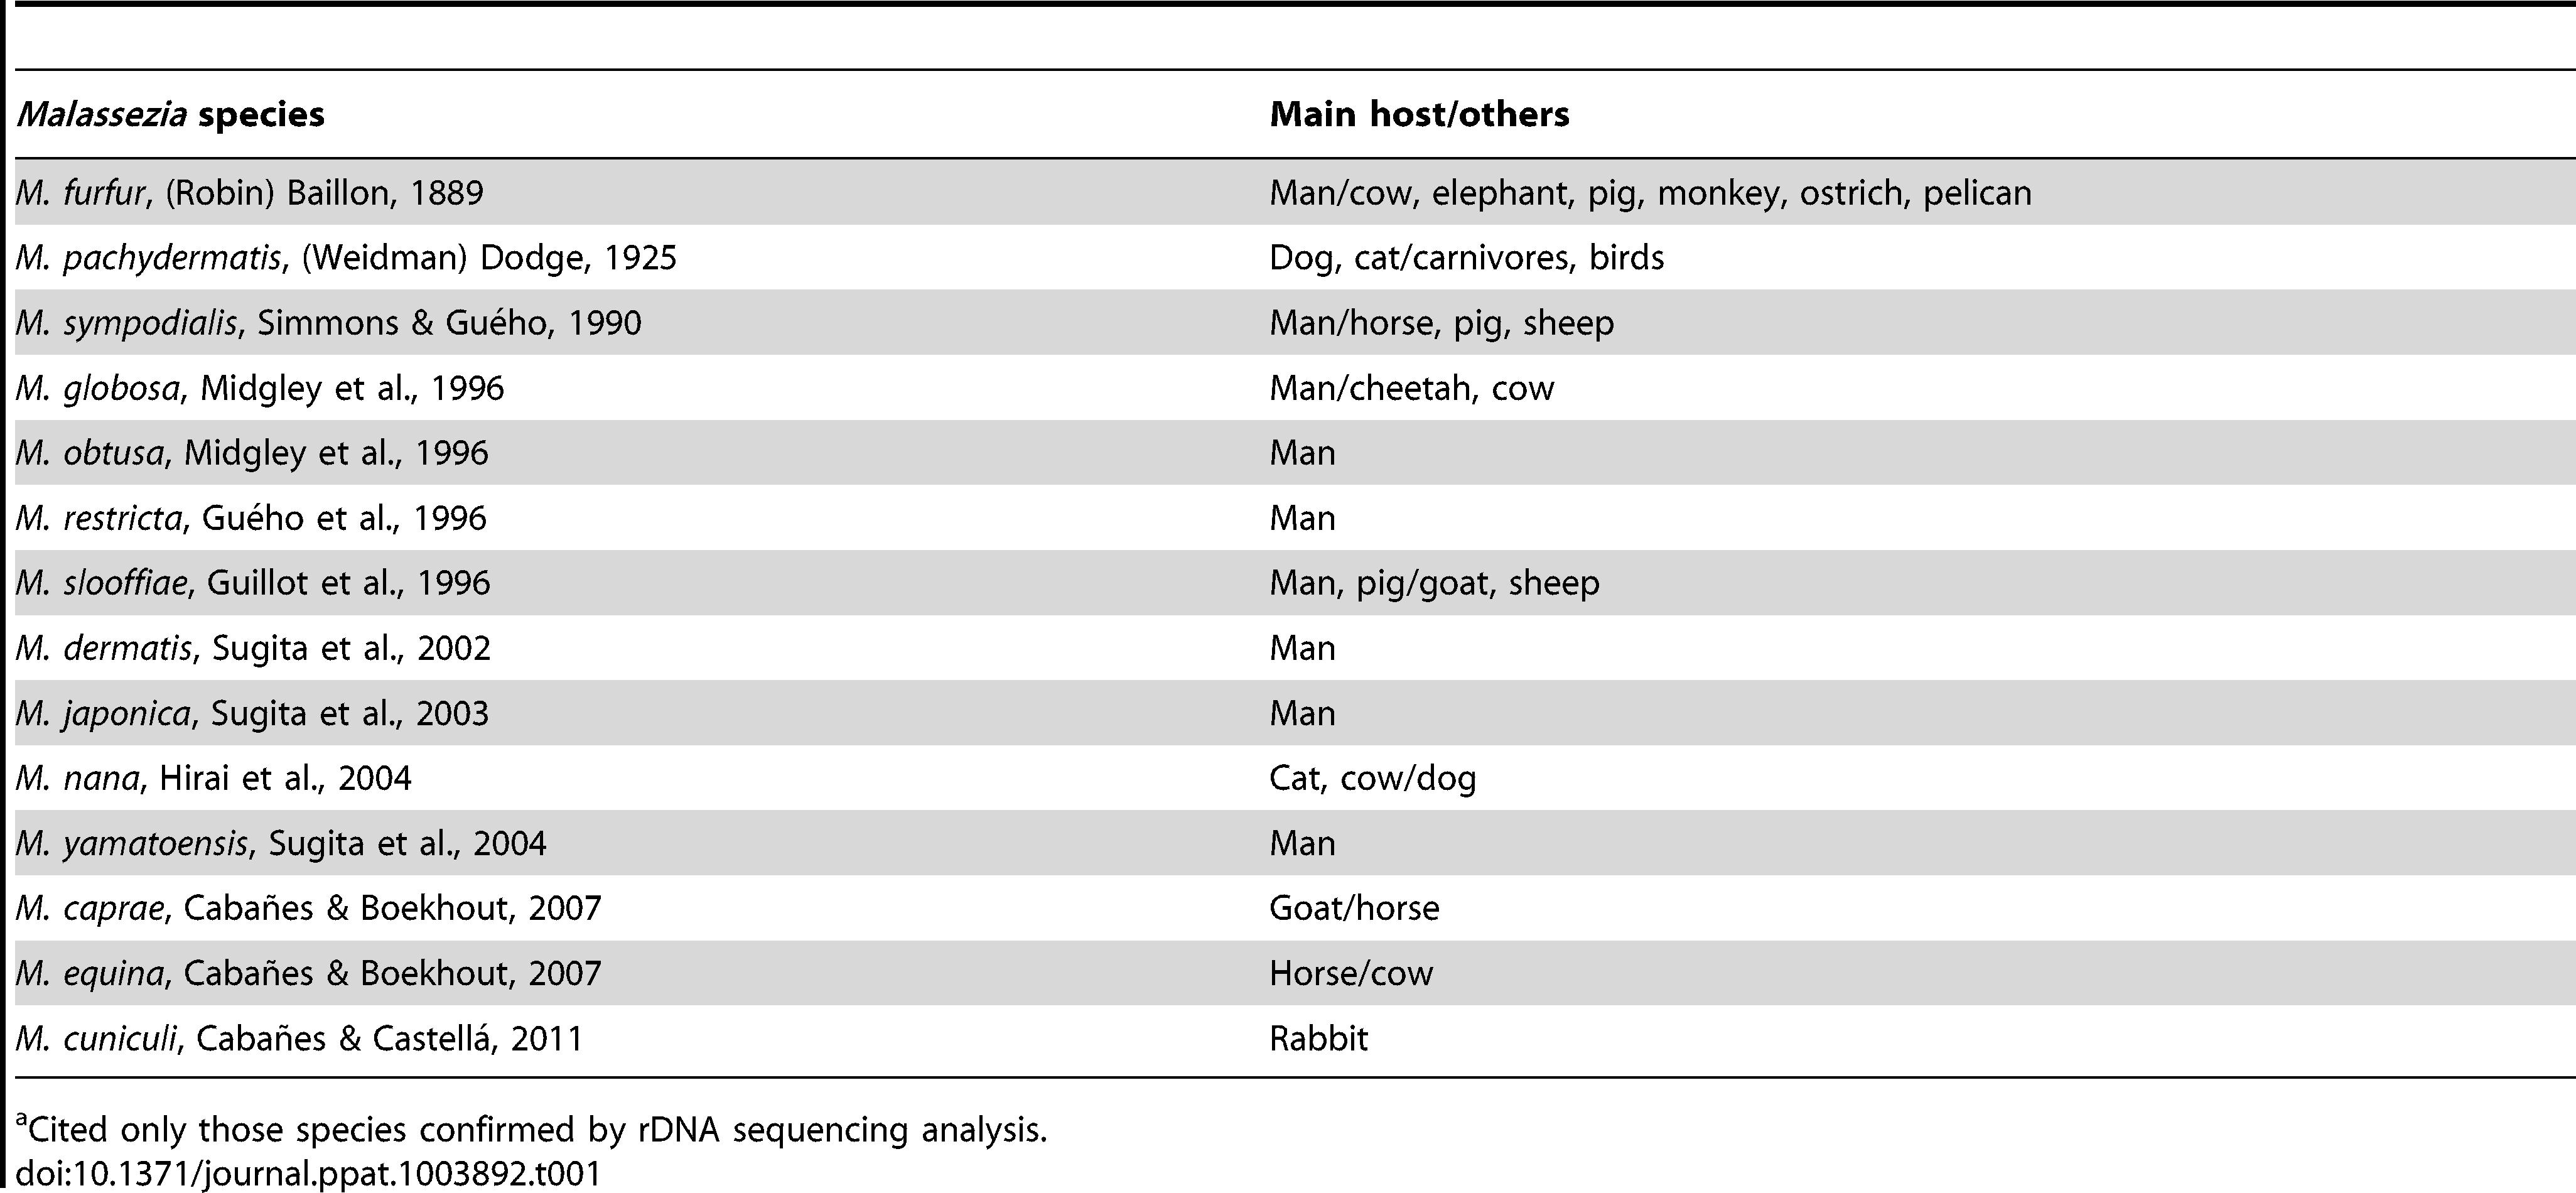 Current described <i>Malassezia</i> species, authorities, year of the description, and their main hosts<em class=&quot;ref&quot;>a</em> <em class=&quot;ref&quot;>[24]</em>.